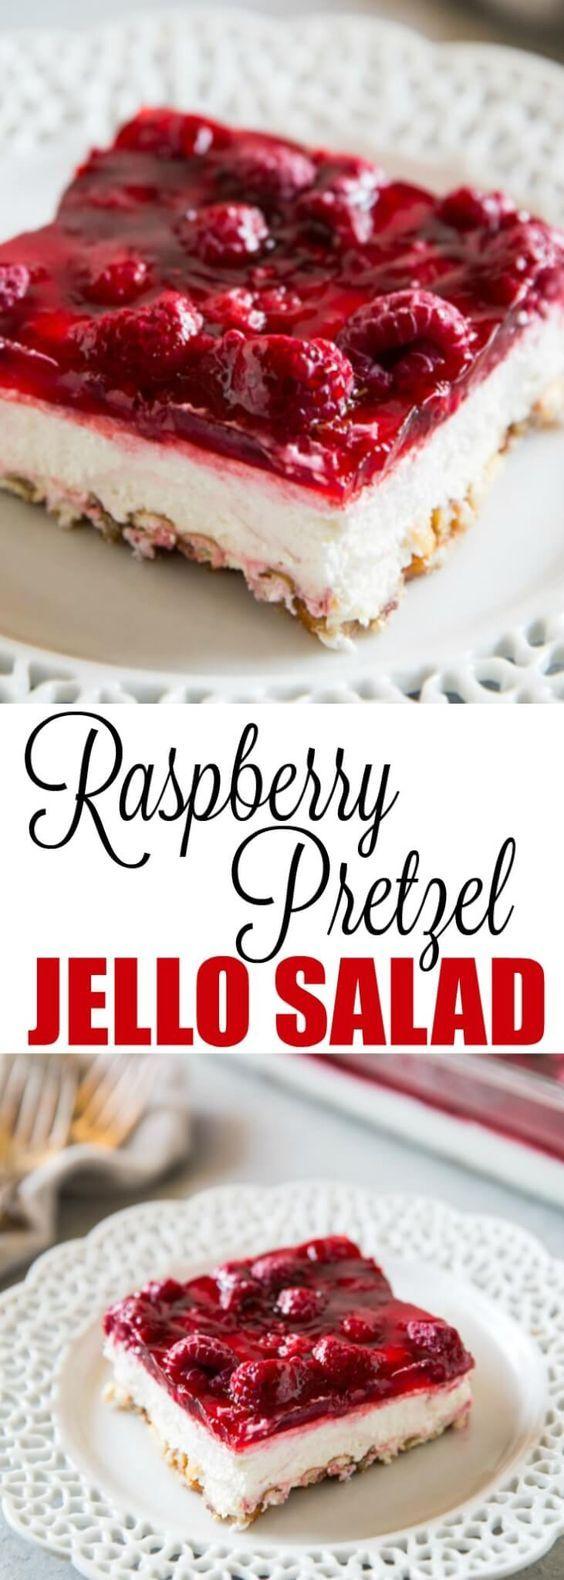 A Midwest classic, Raspberry Pretzel Jello Salad h…